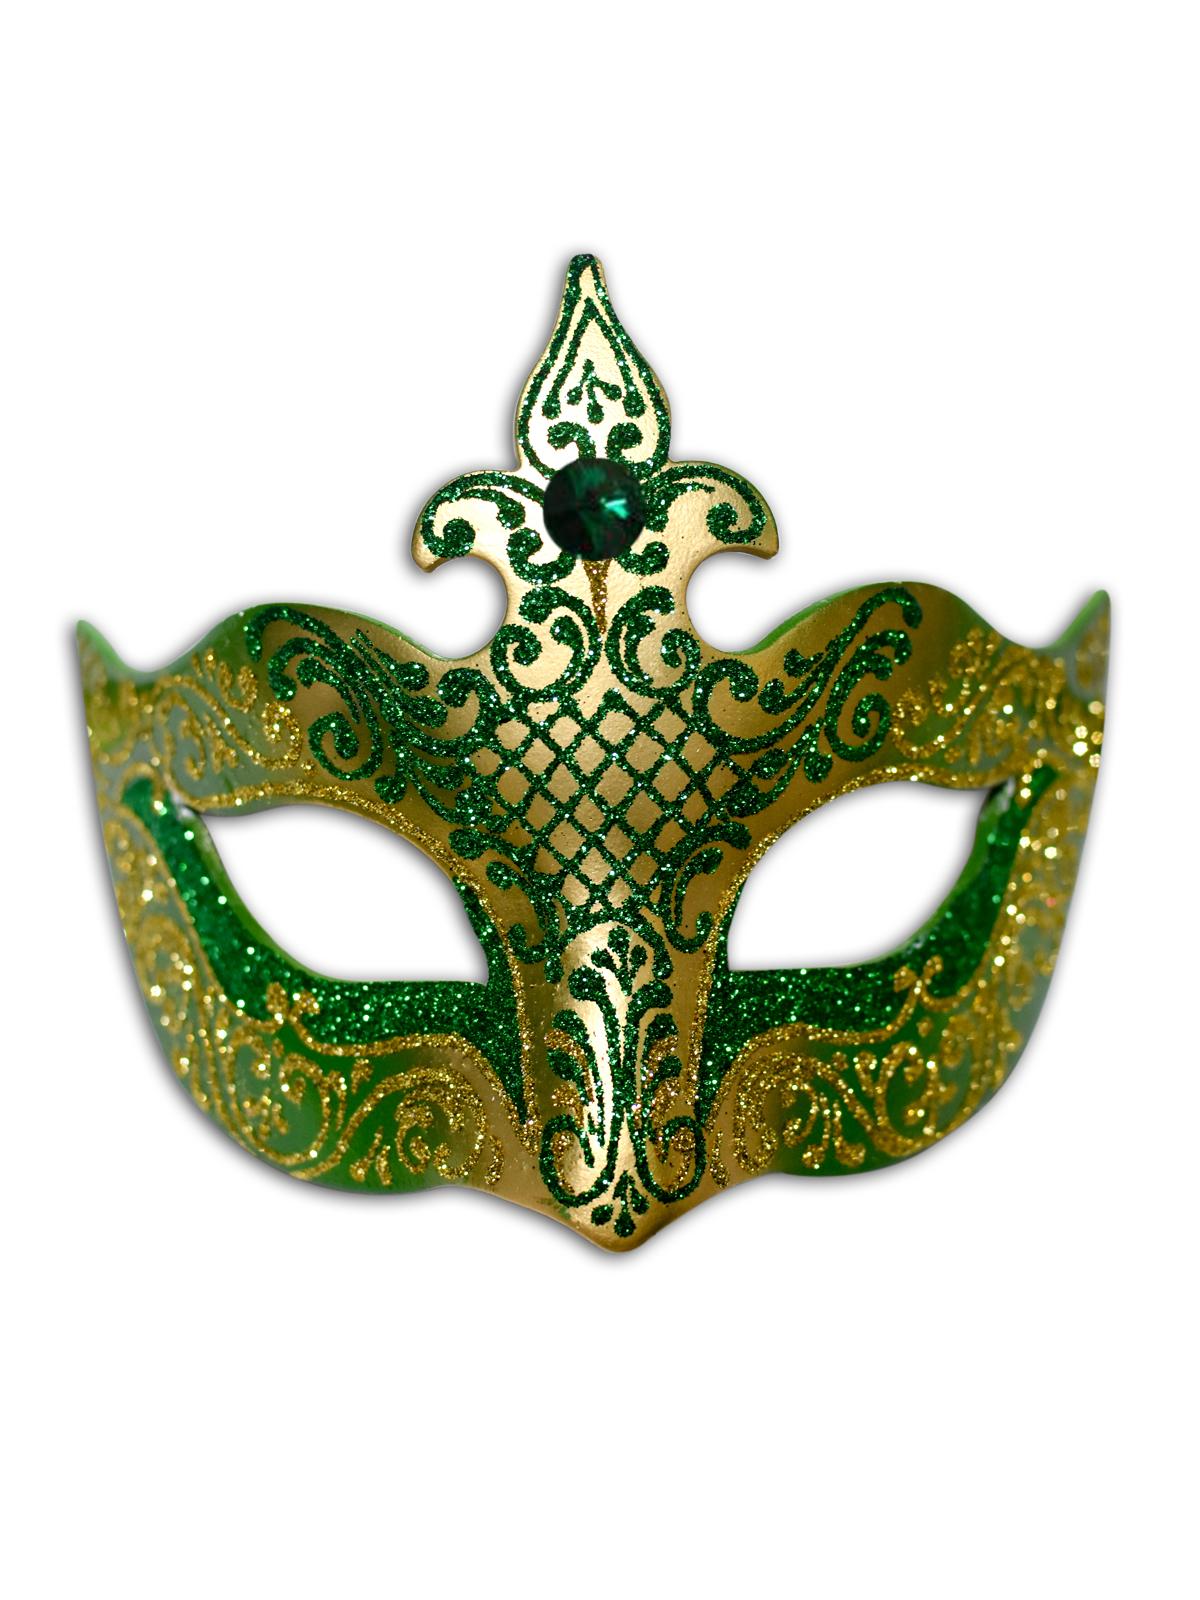 Colombina Vibia Venetian Green/Gold Mask,C101GRG